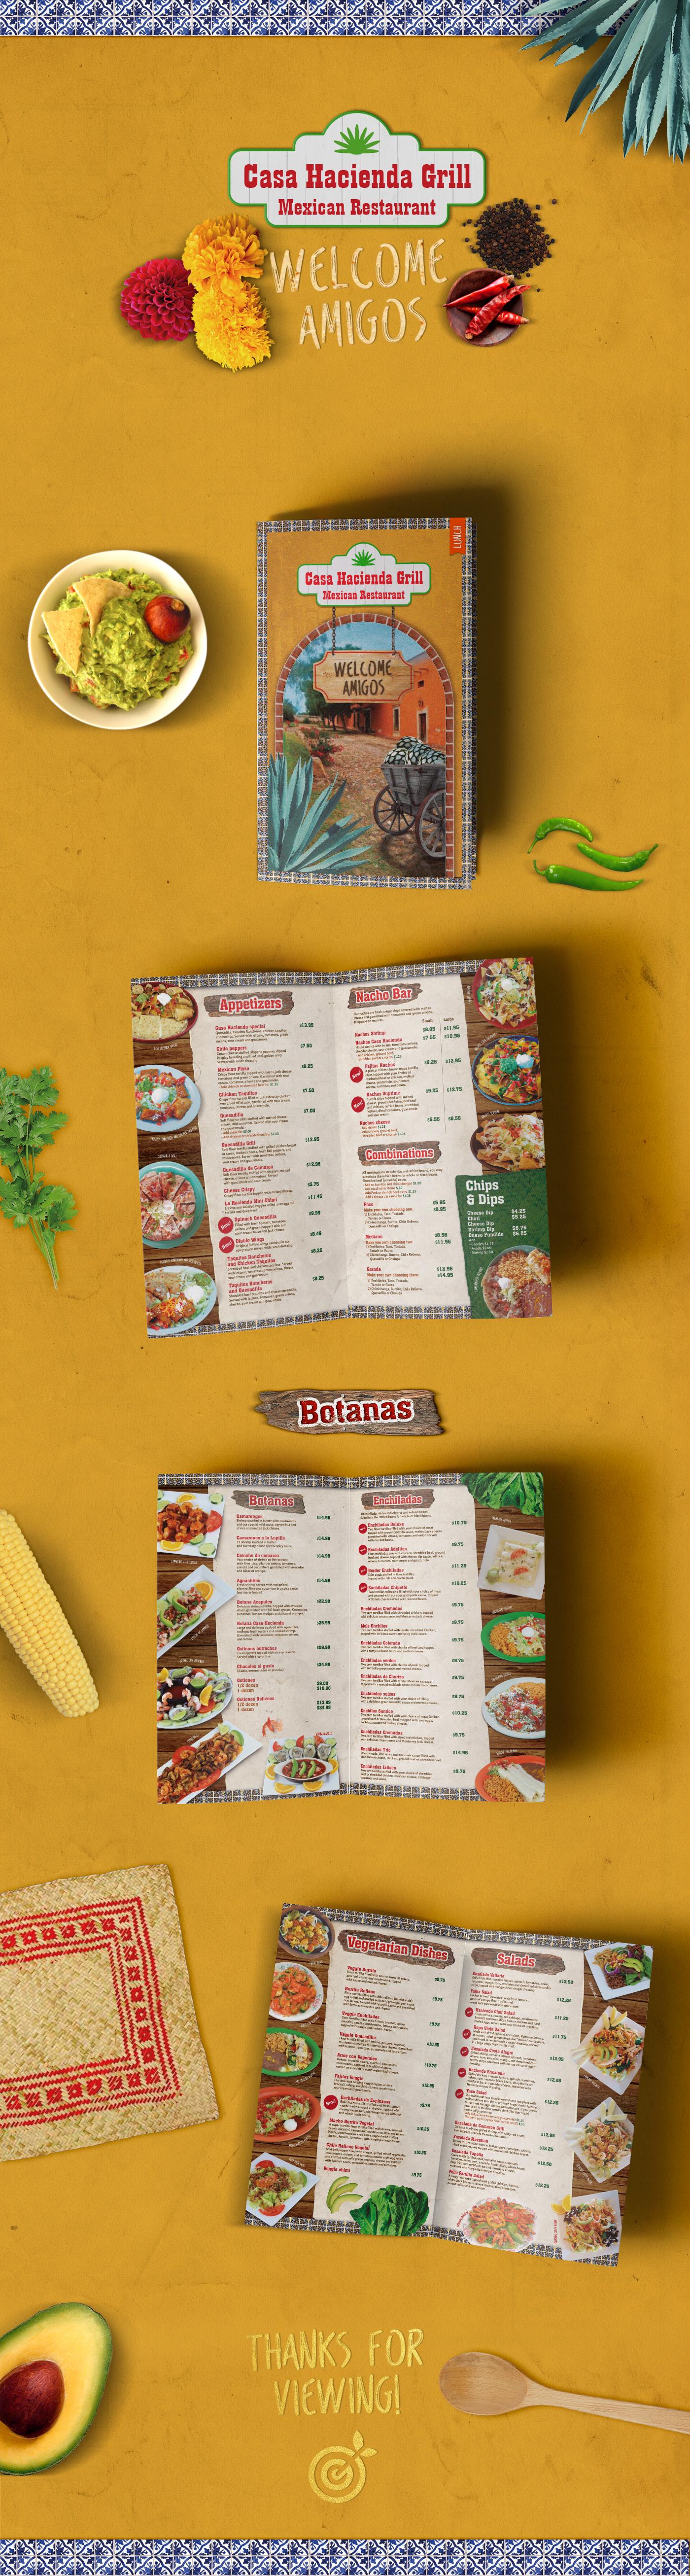 Food  mexico menu restaurant agave corn comida texas dinner lunch colors yellow Latin